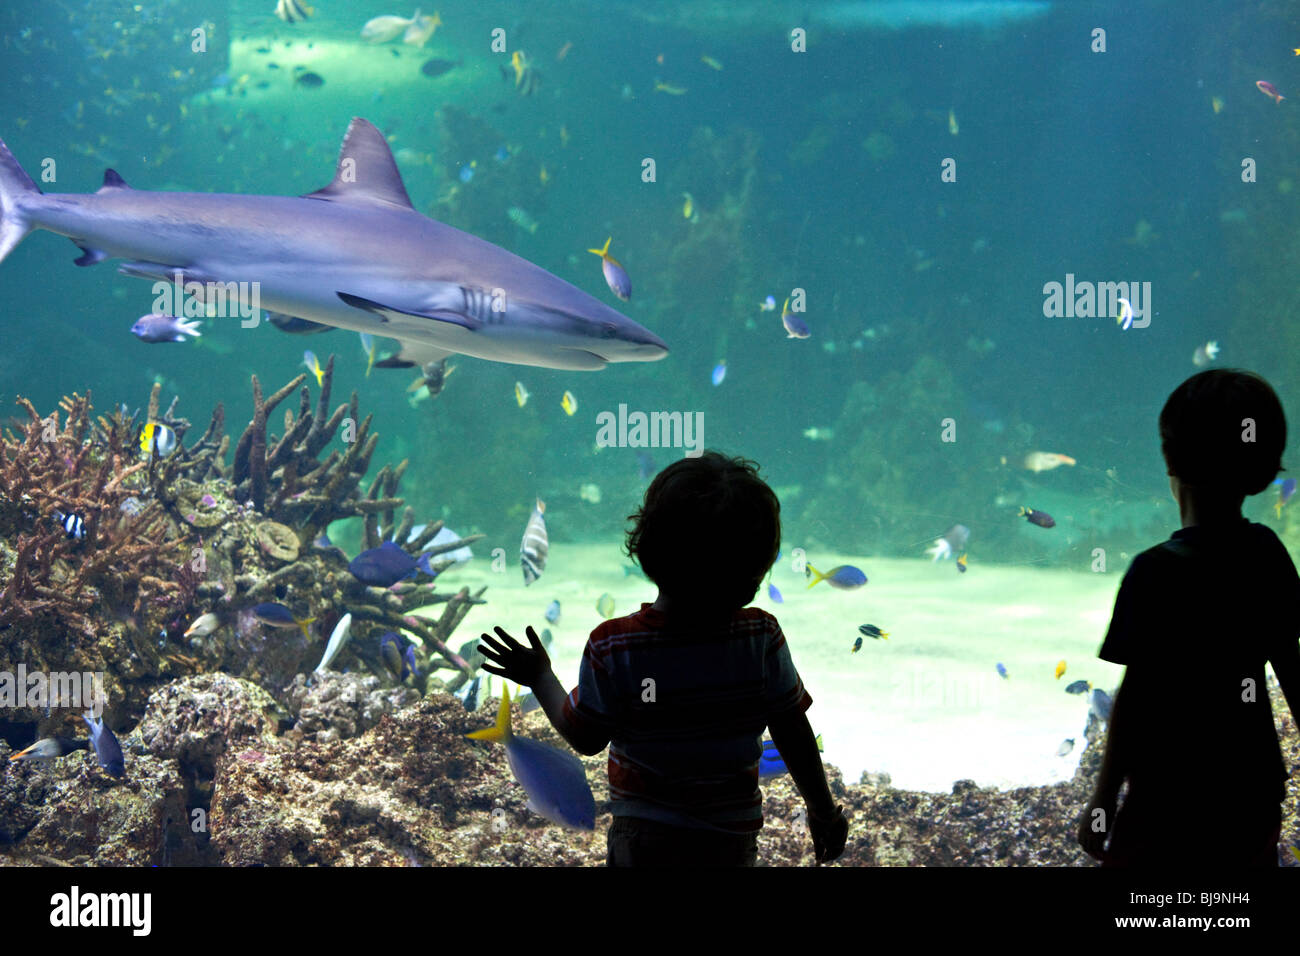 Children watching sharks in Sydney Aquarium, Australia - Stock Image